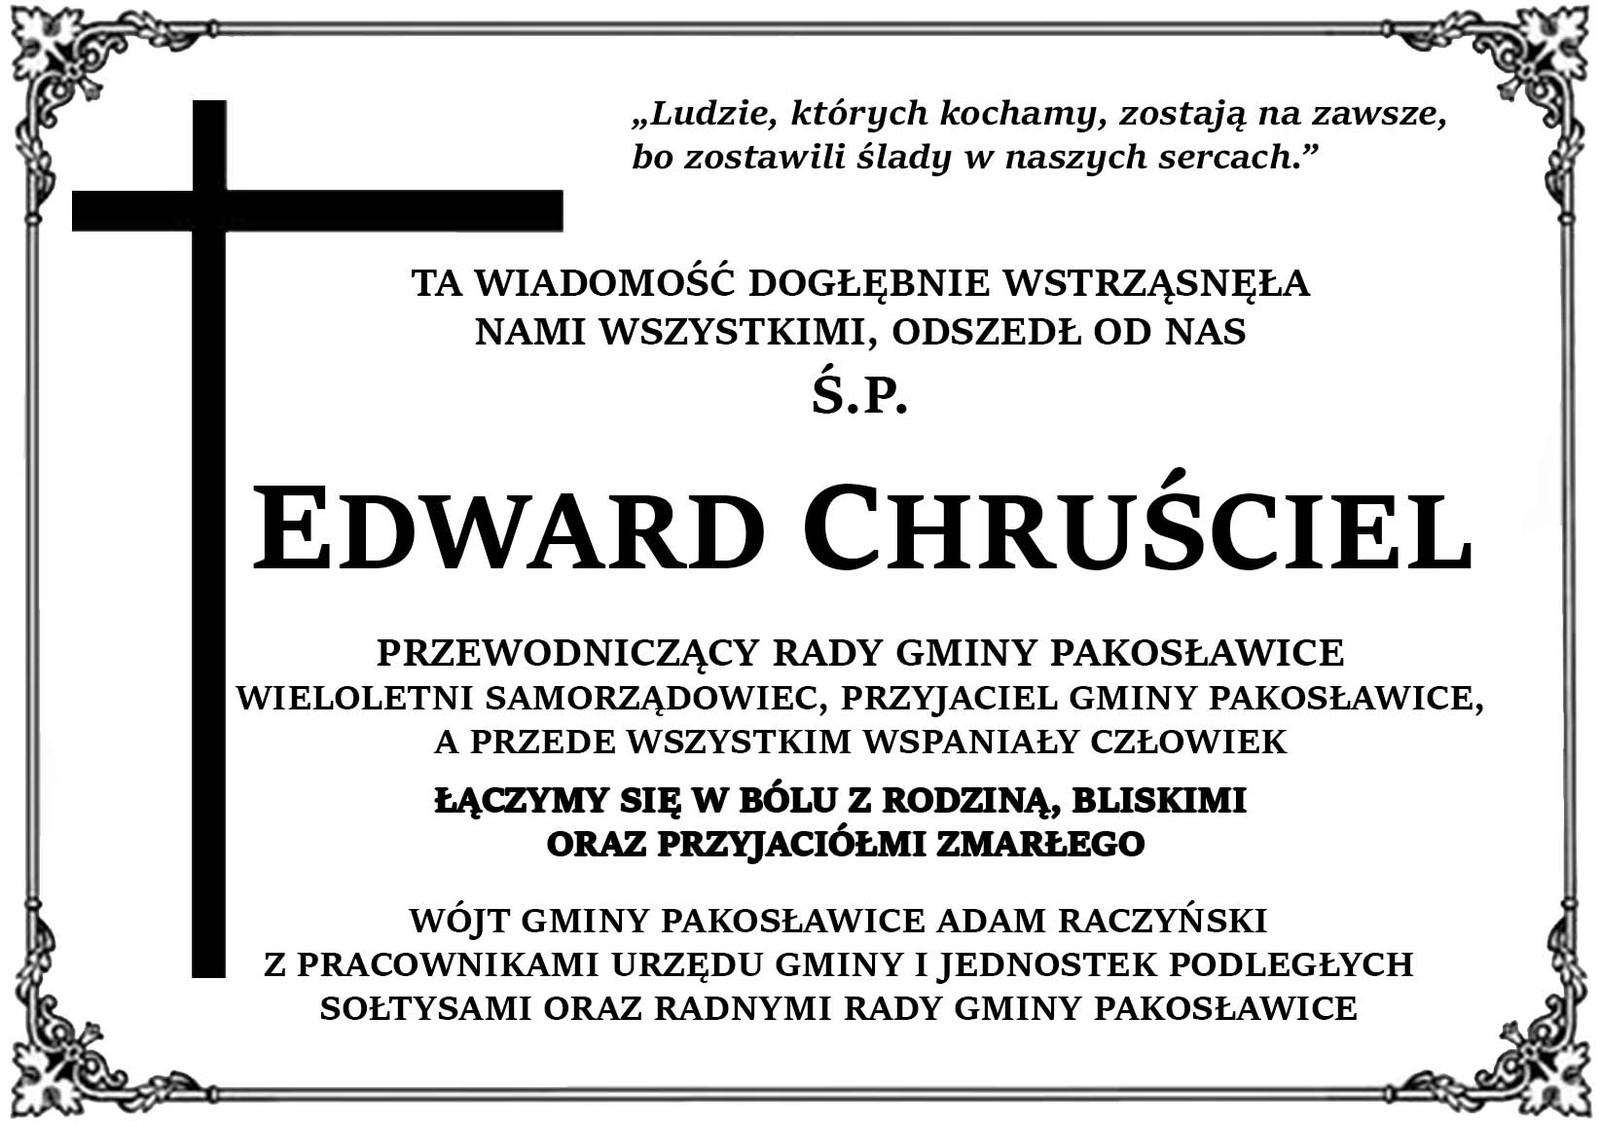 nekrolog_edward_chrusciel.jpeg